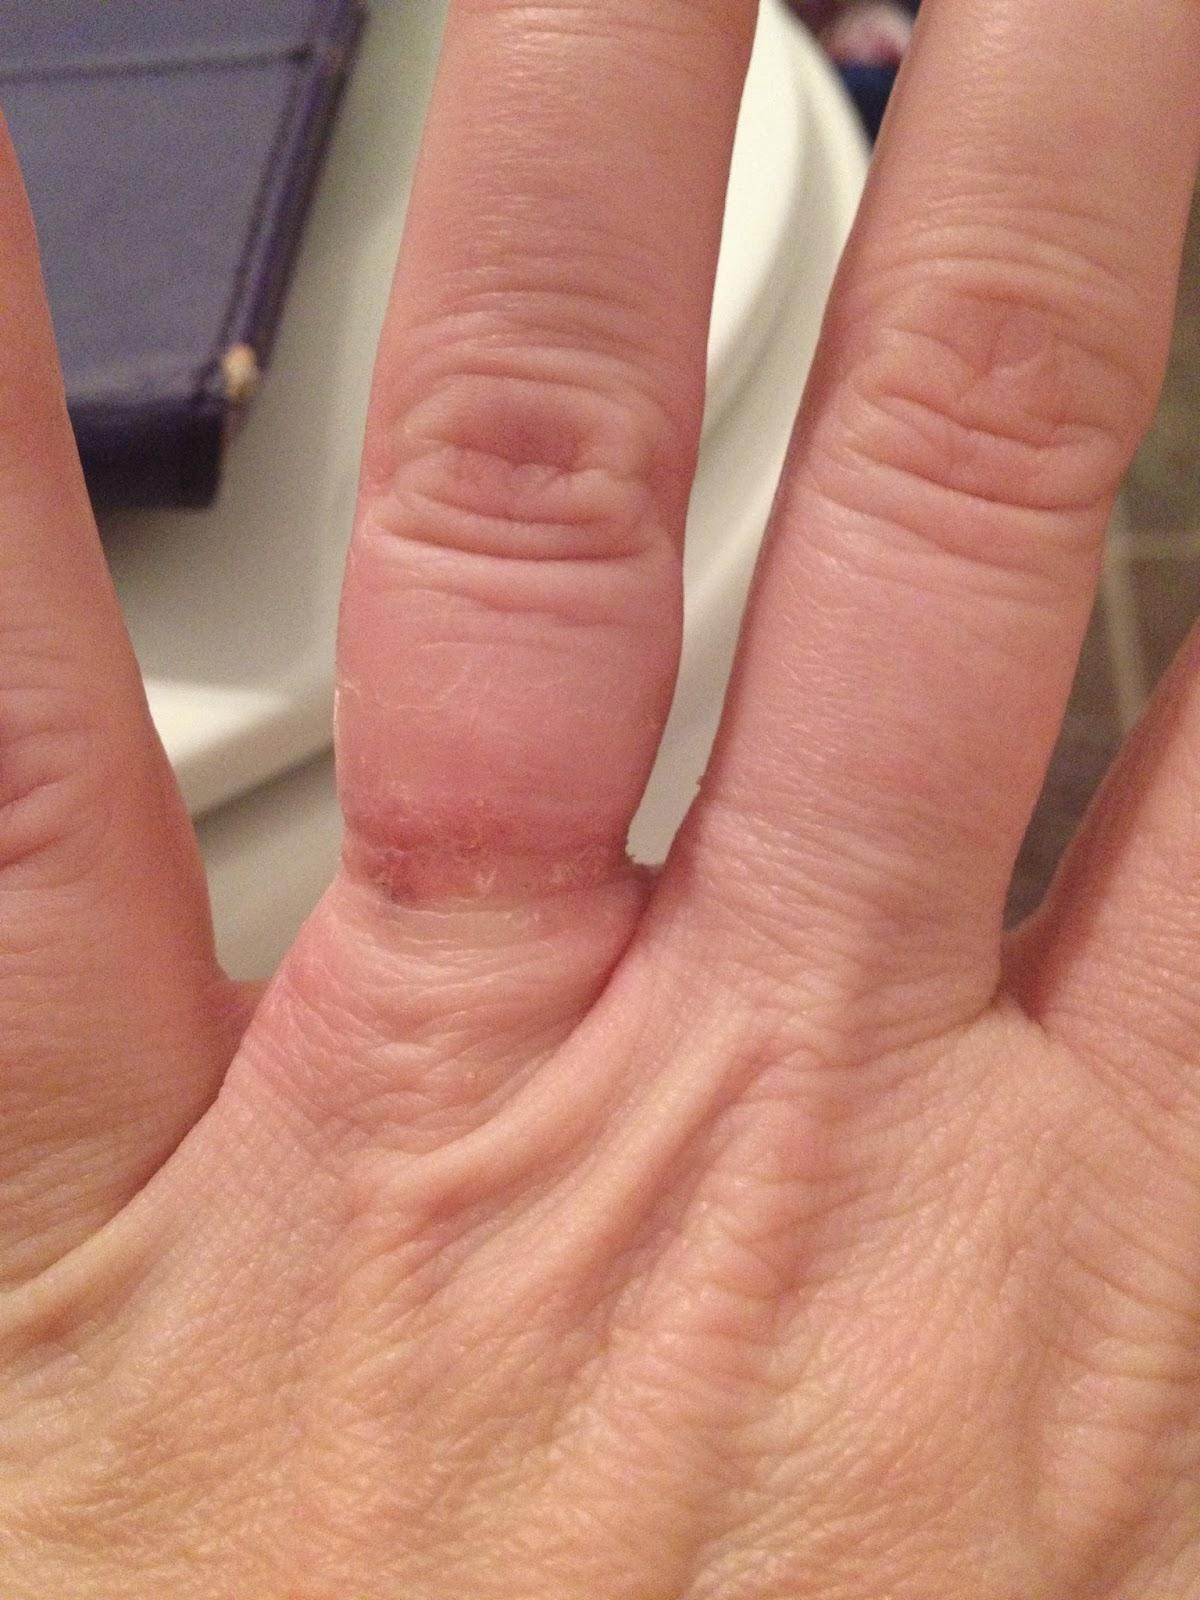 Allergic to my wedding ring